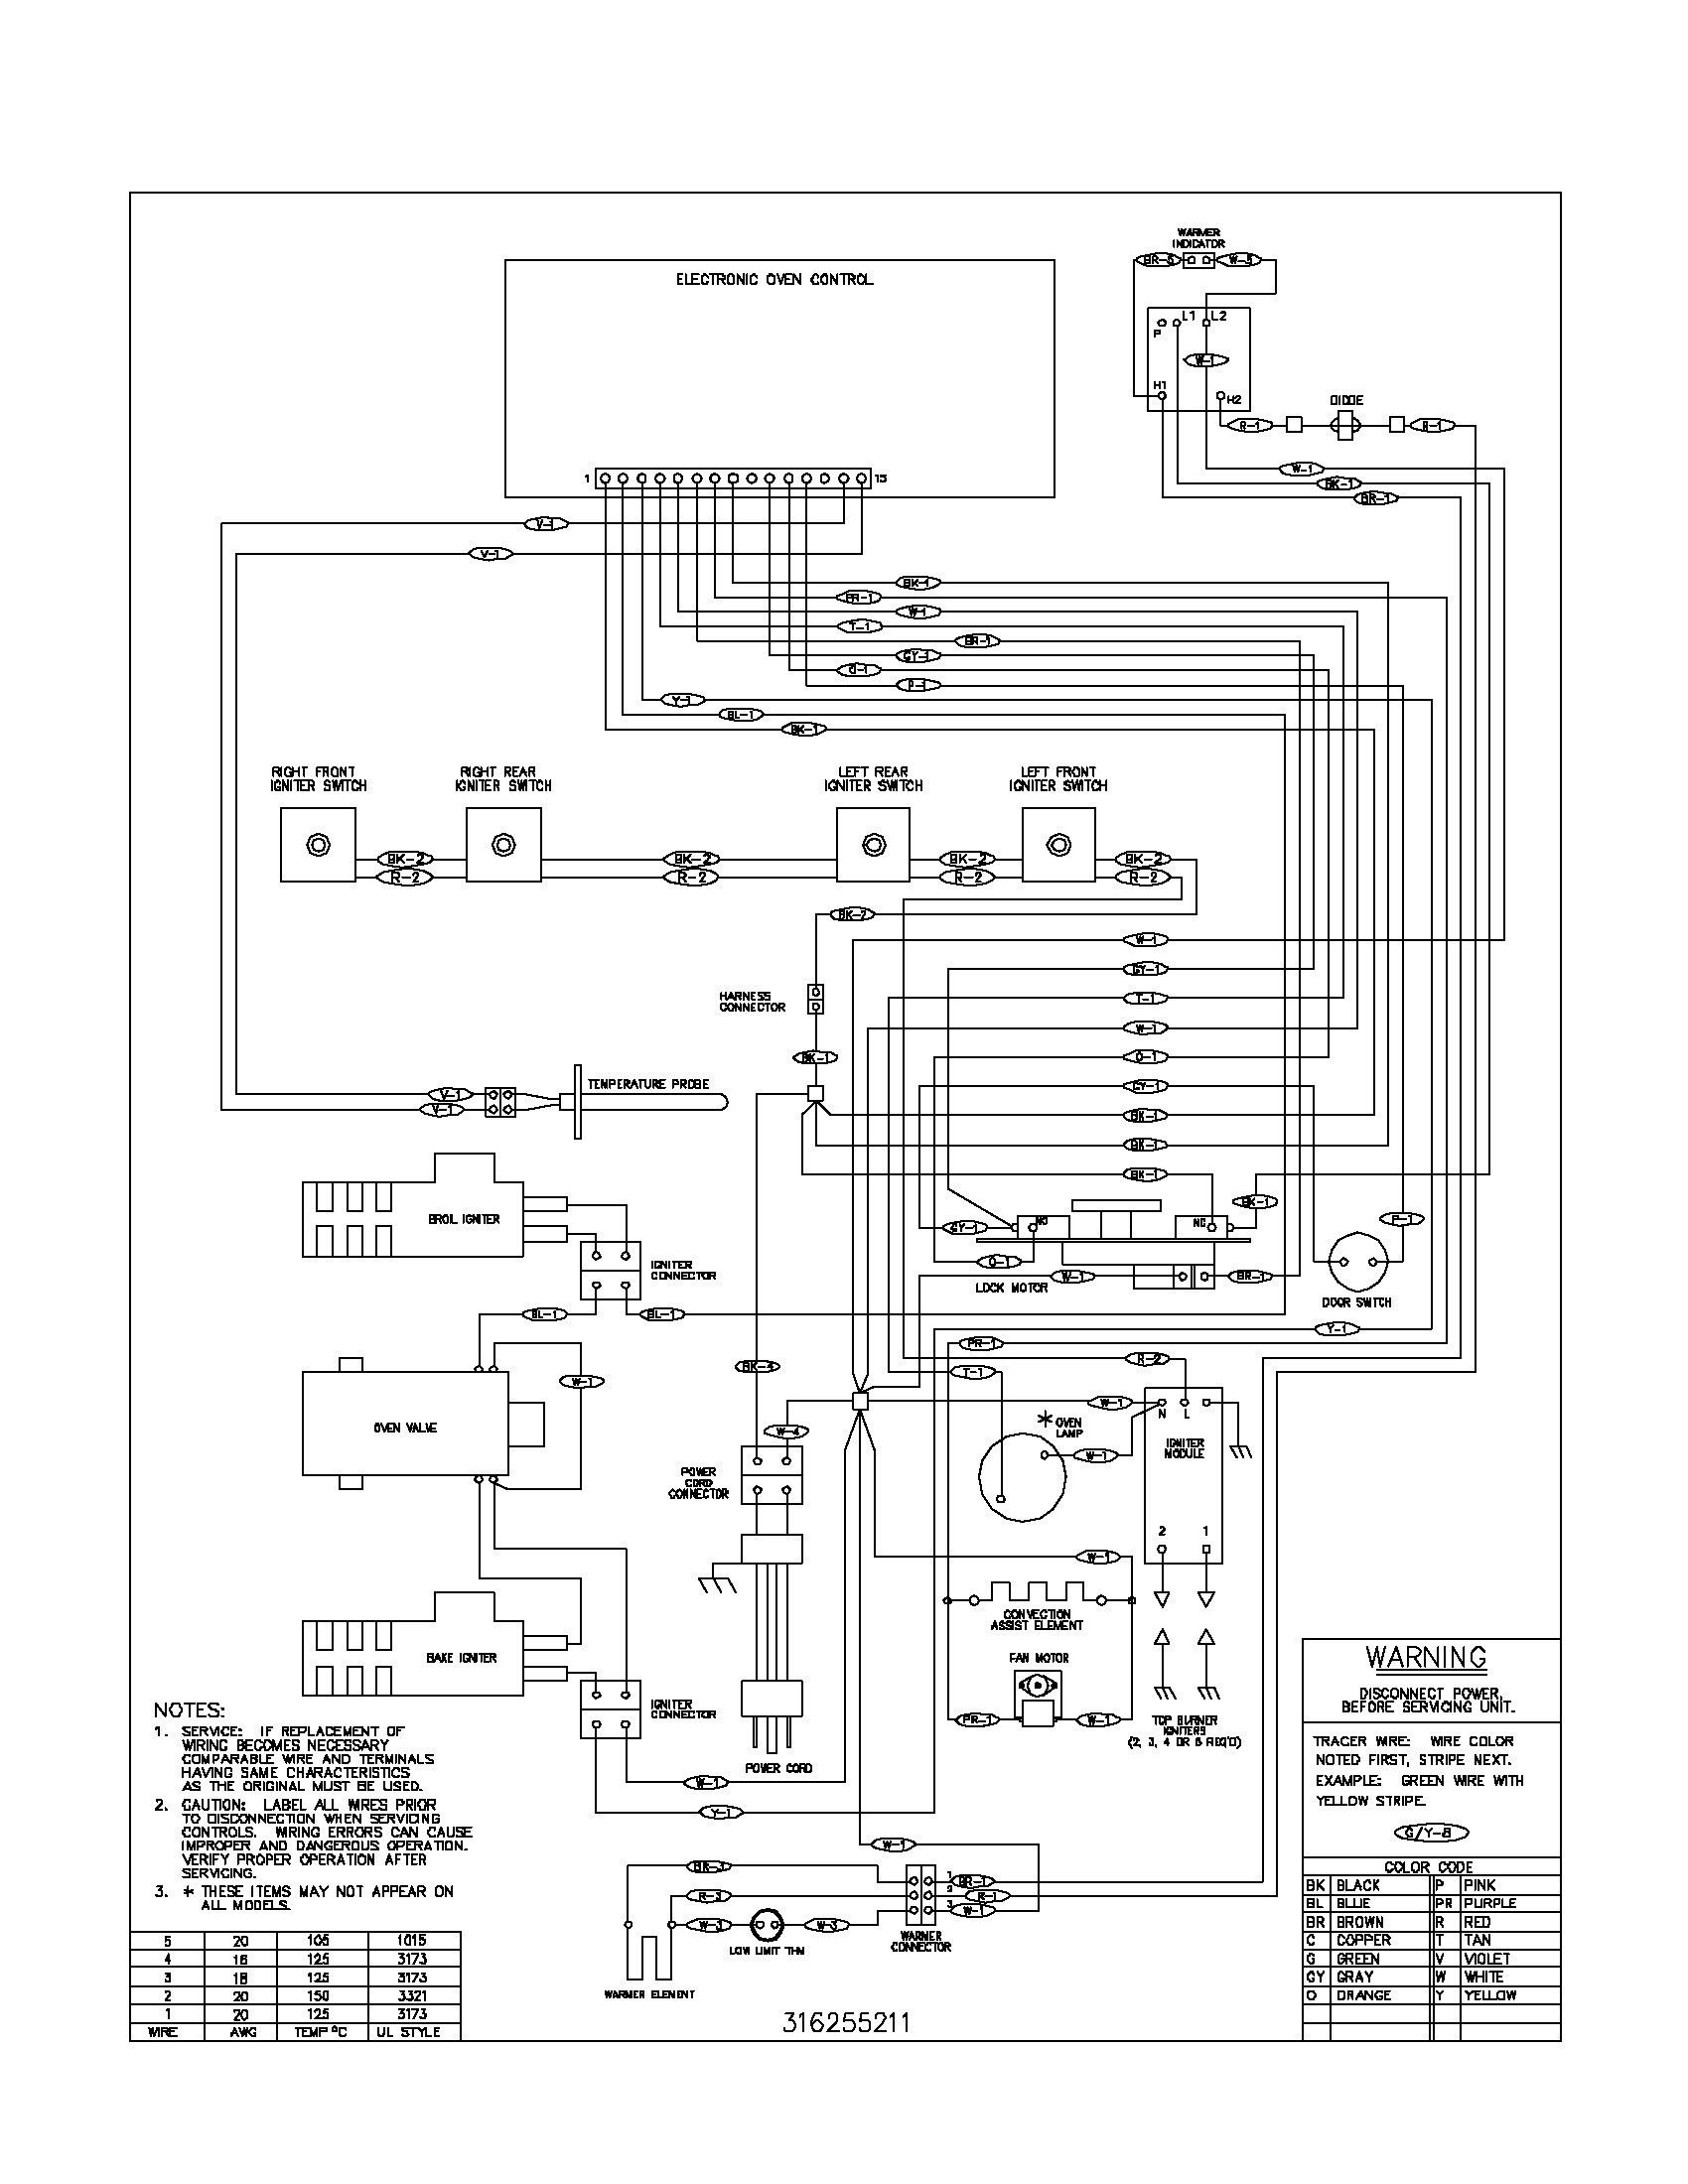 New Ge Dimmer Switch Wiring Diagram Diagram Diagramtemplate Diagramsample Datos